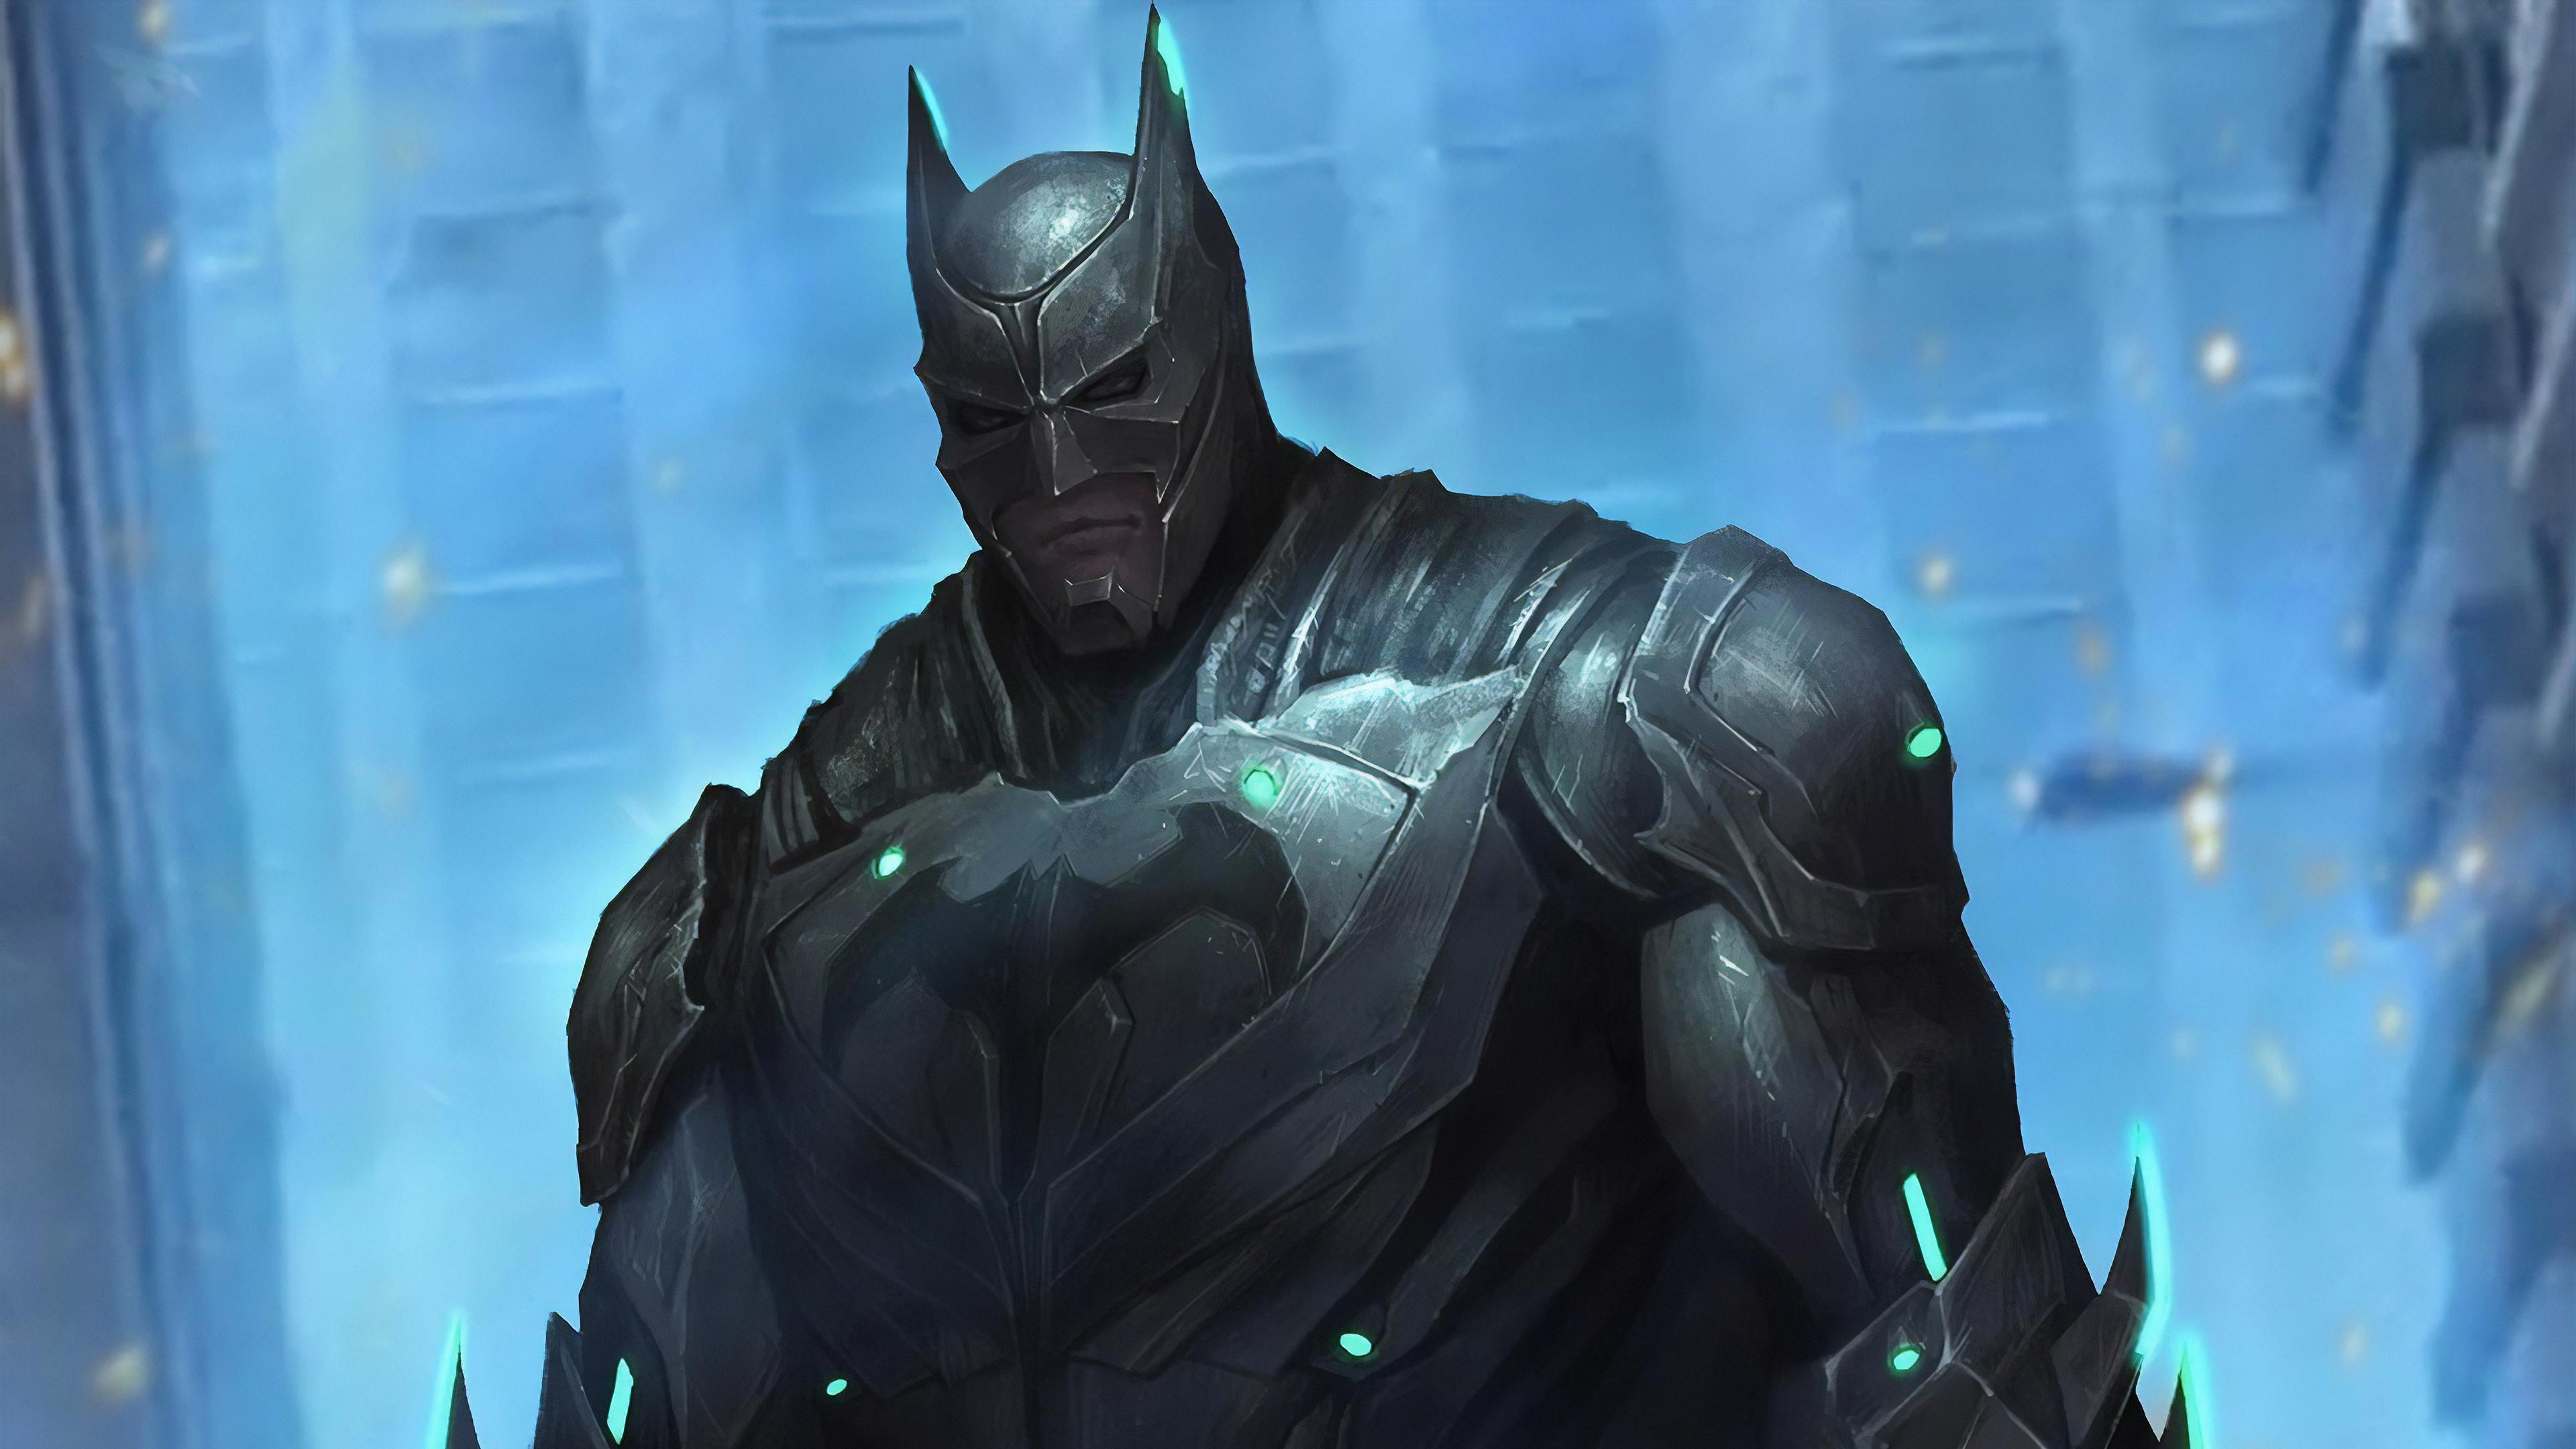 batman fanart 1568055002 - Batman Fanart - superheroes wallpapers, hd-wallpapers, digital art wallpapers, batman wallpapers, artwork wallpapers, artstation wallpapers, 4k-wallpapers